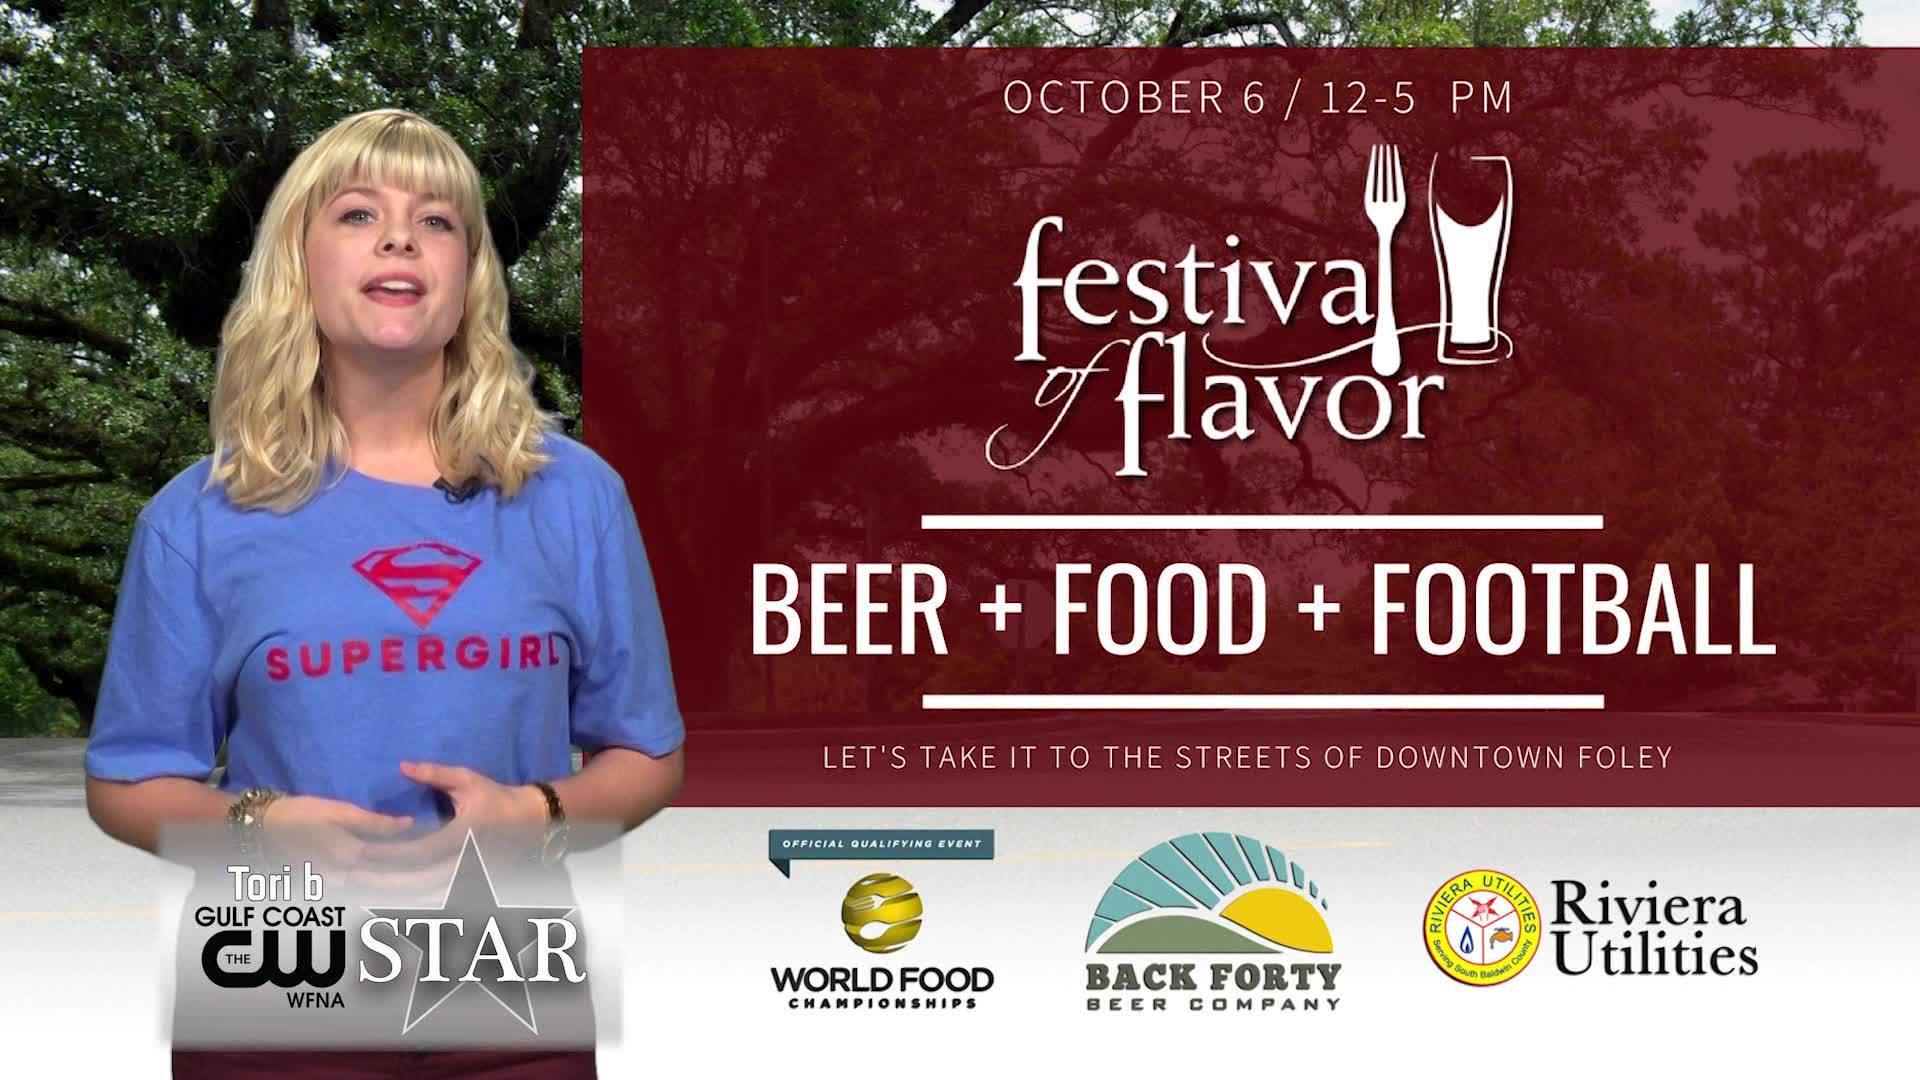 Festival of Flavor 2018